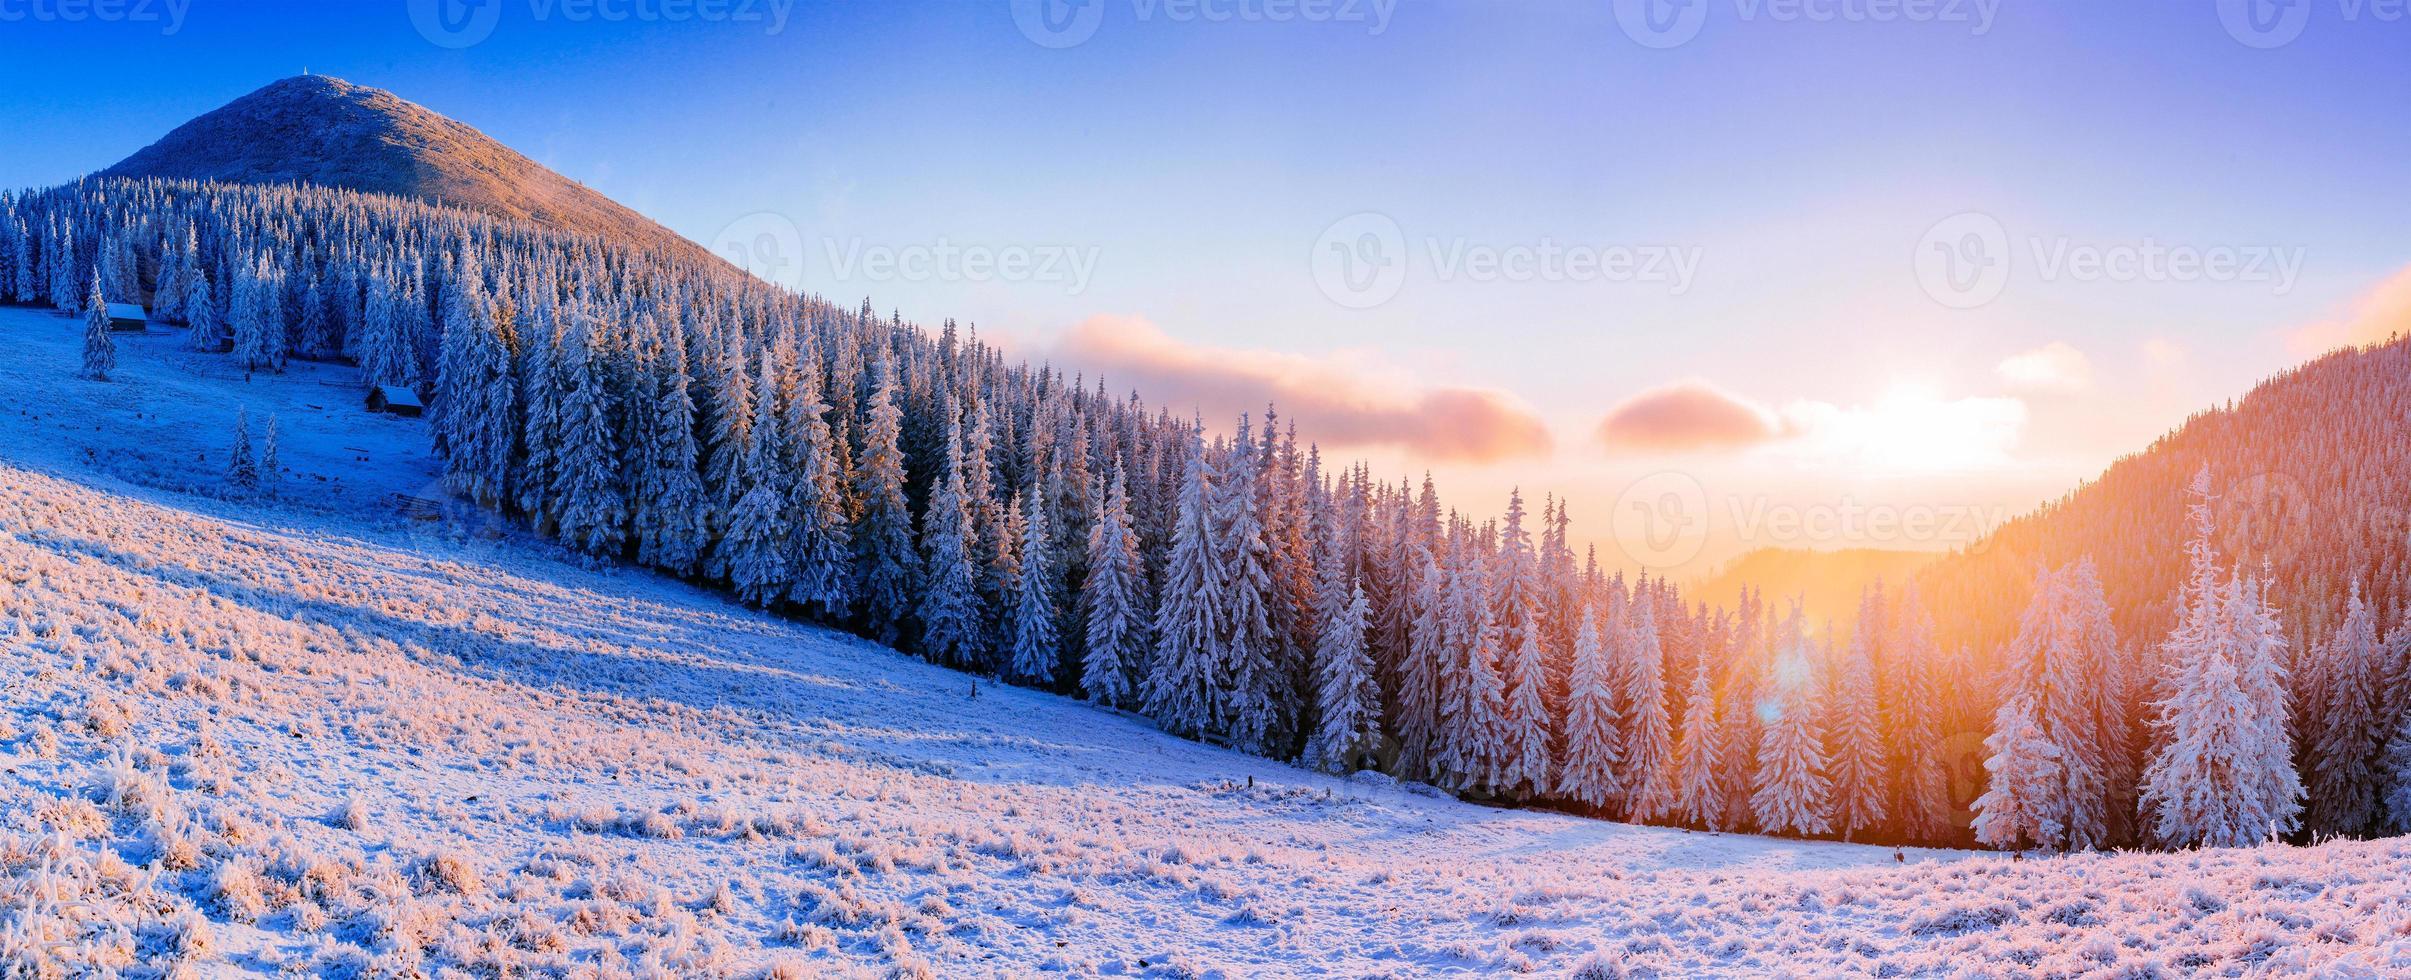 winter landscape trees in frost photo